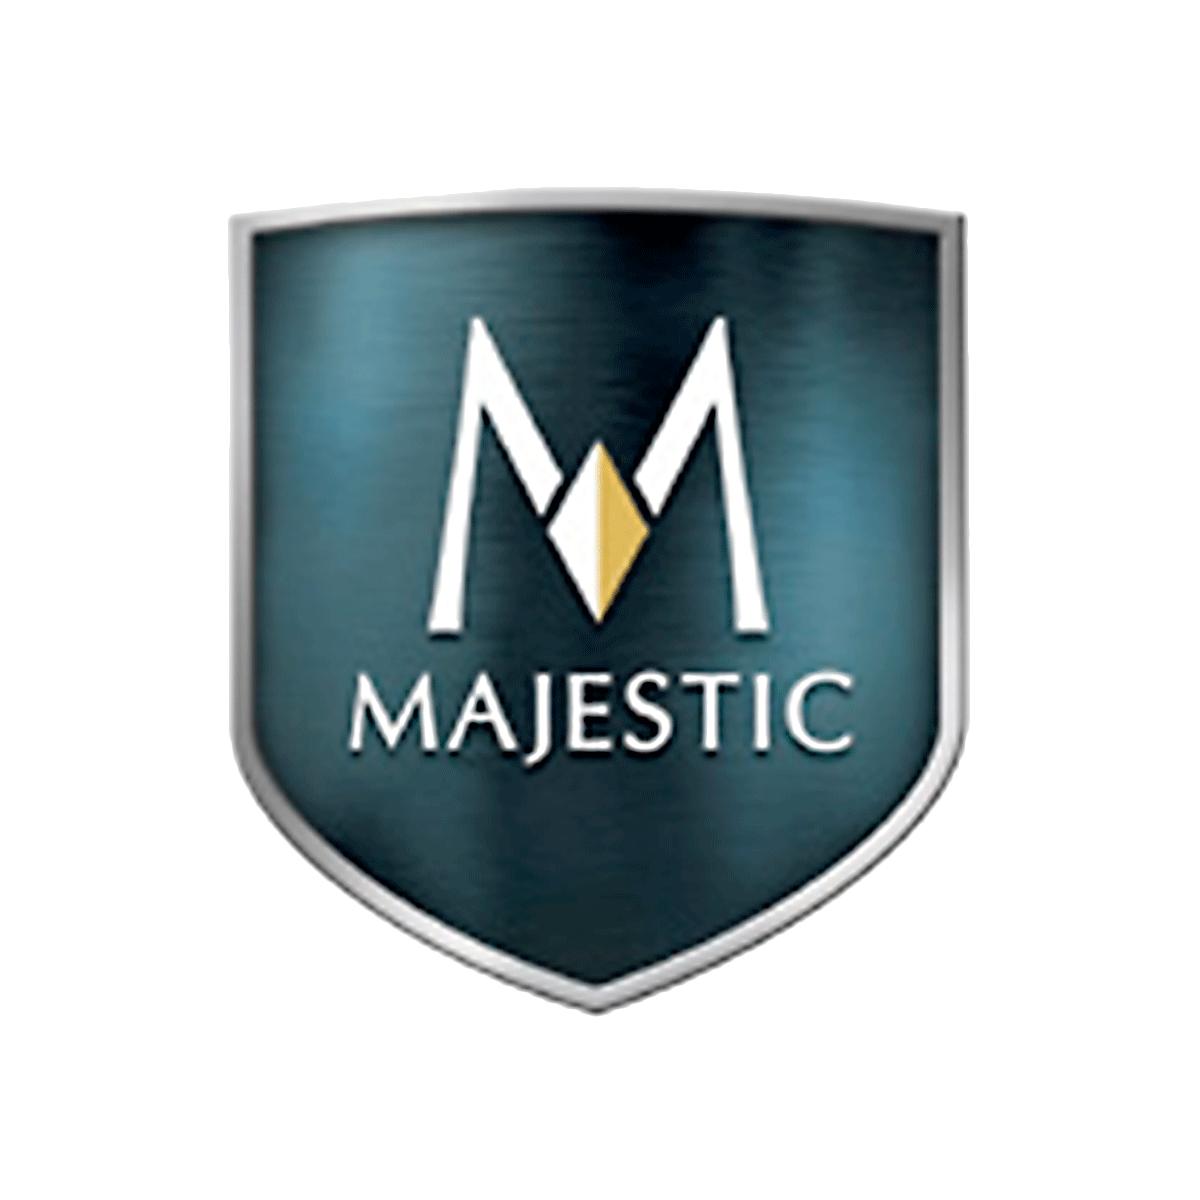 Majestic - Majestic Fireplaces Wood Burning Fireplace Majestic Products